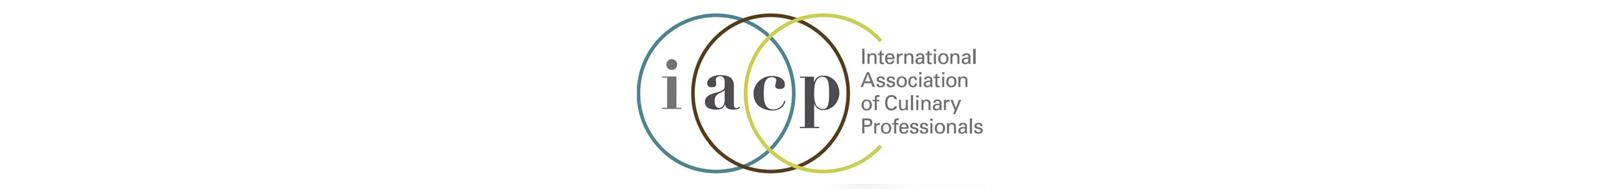 IACP.logo.jpg